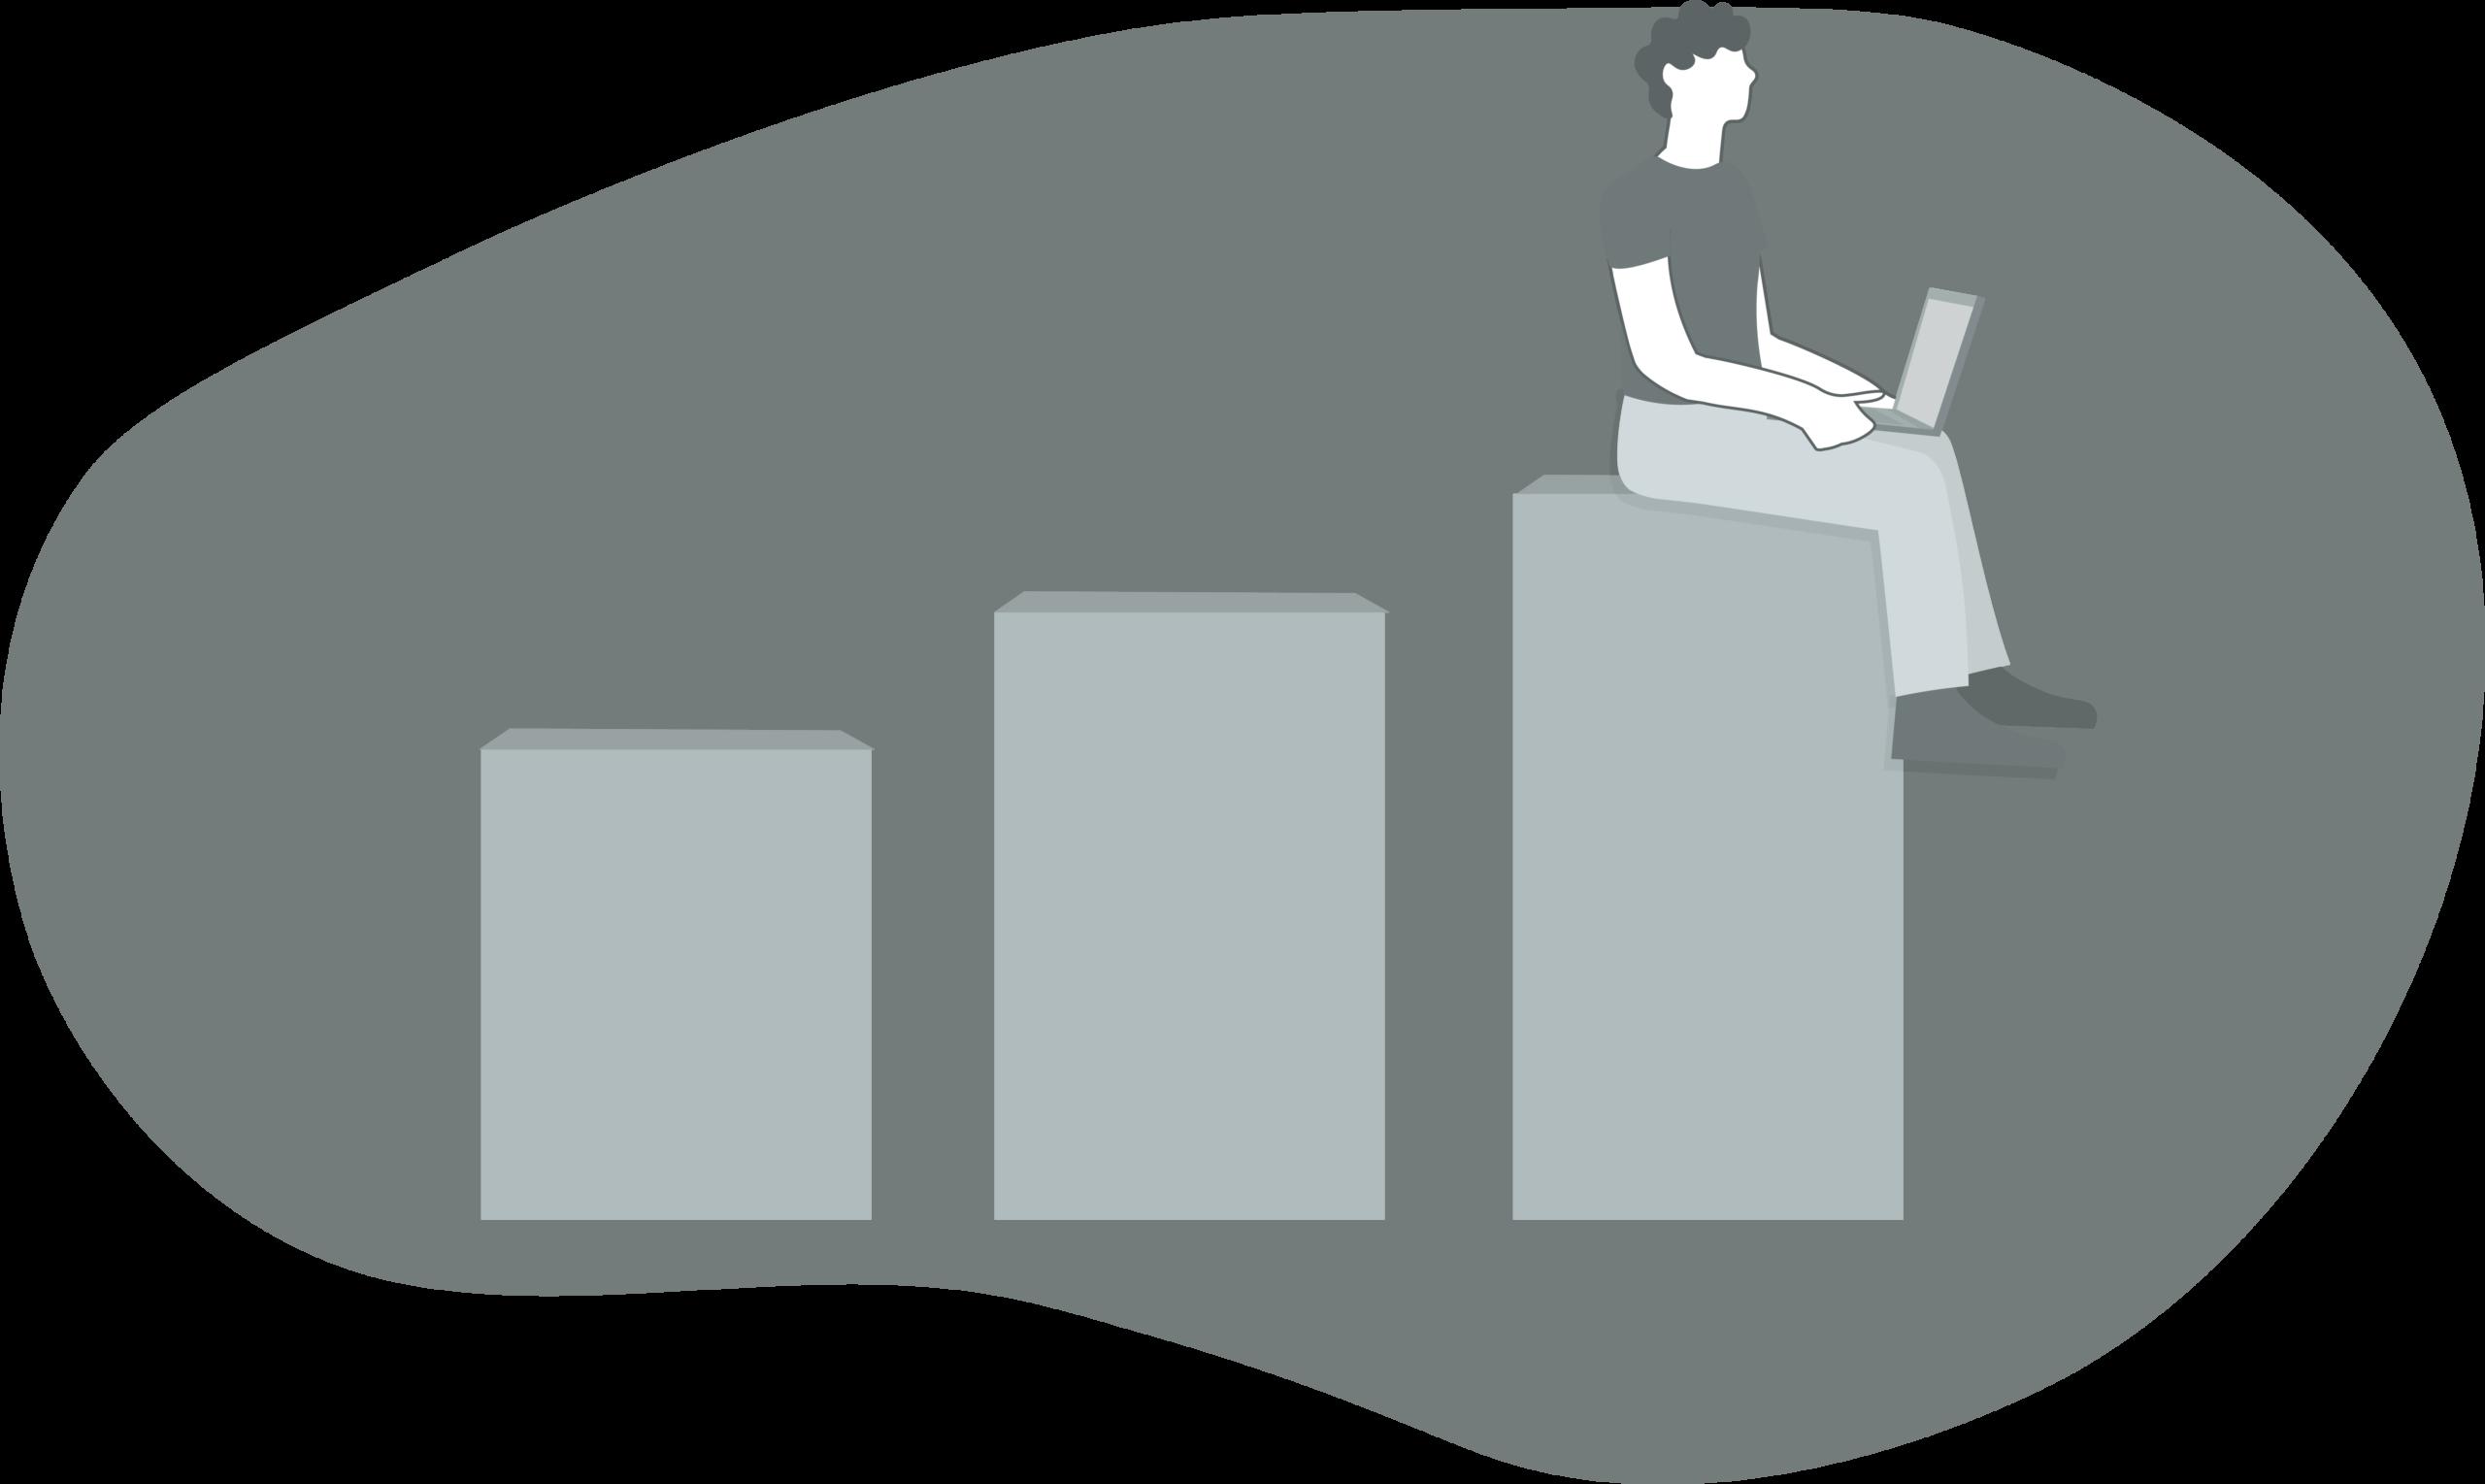 Tracking growth Illustration